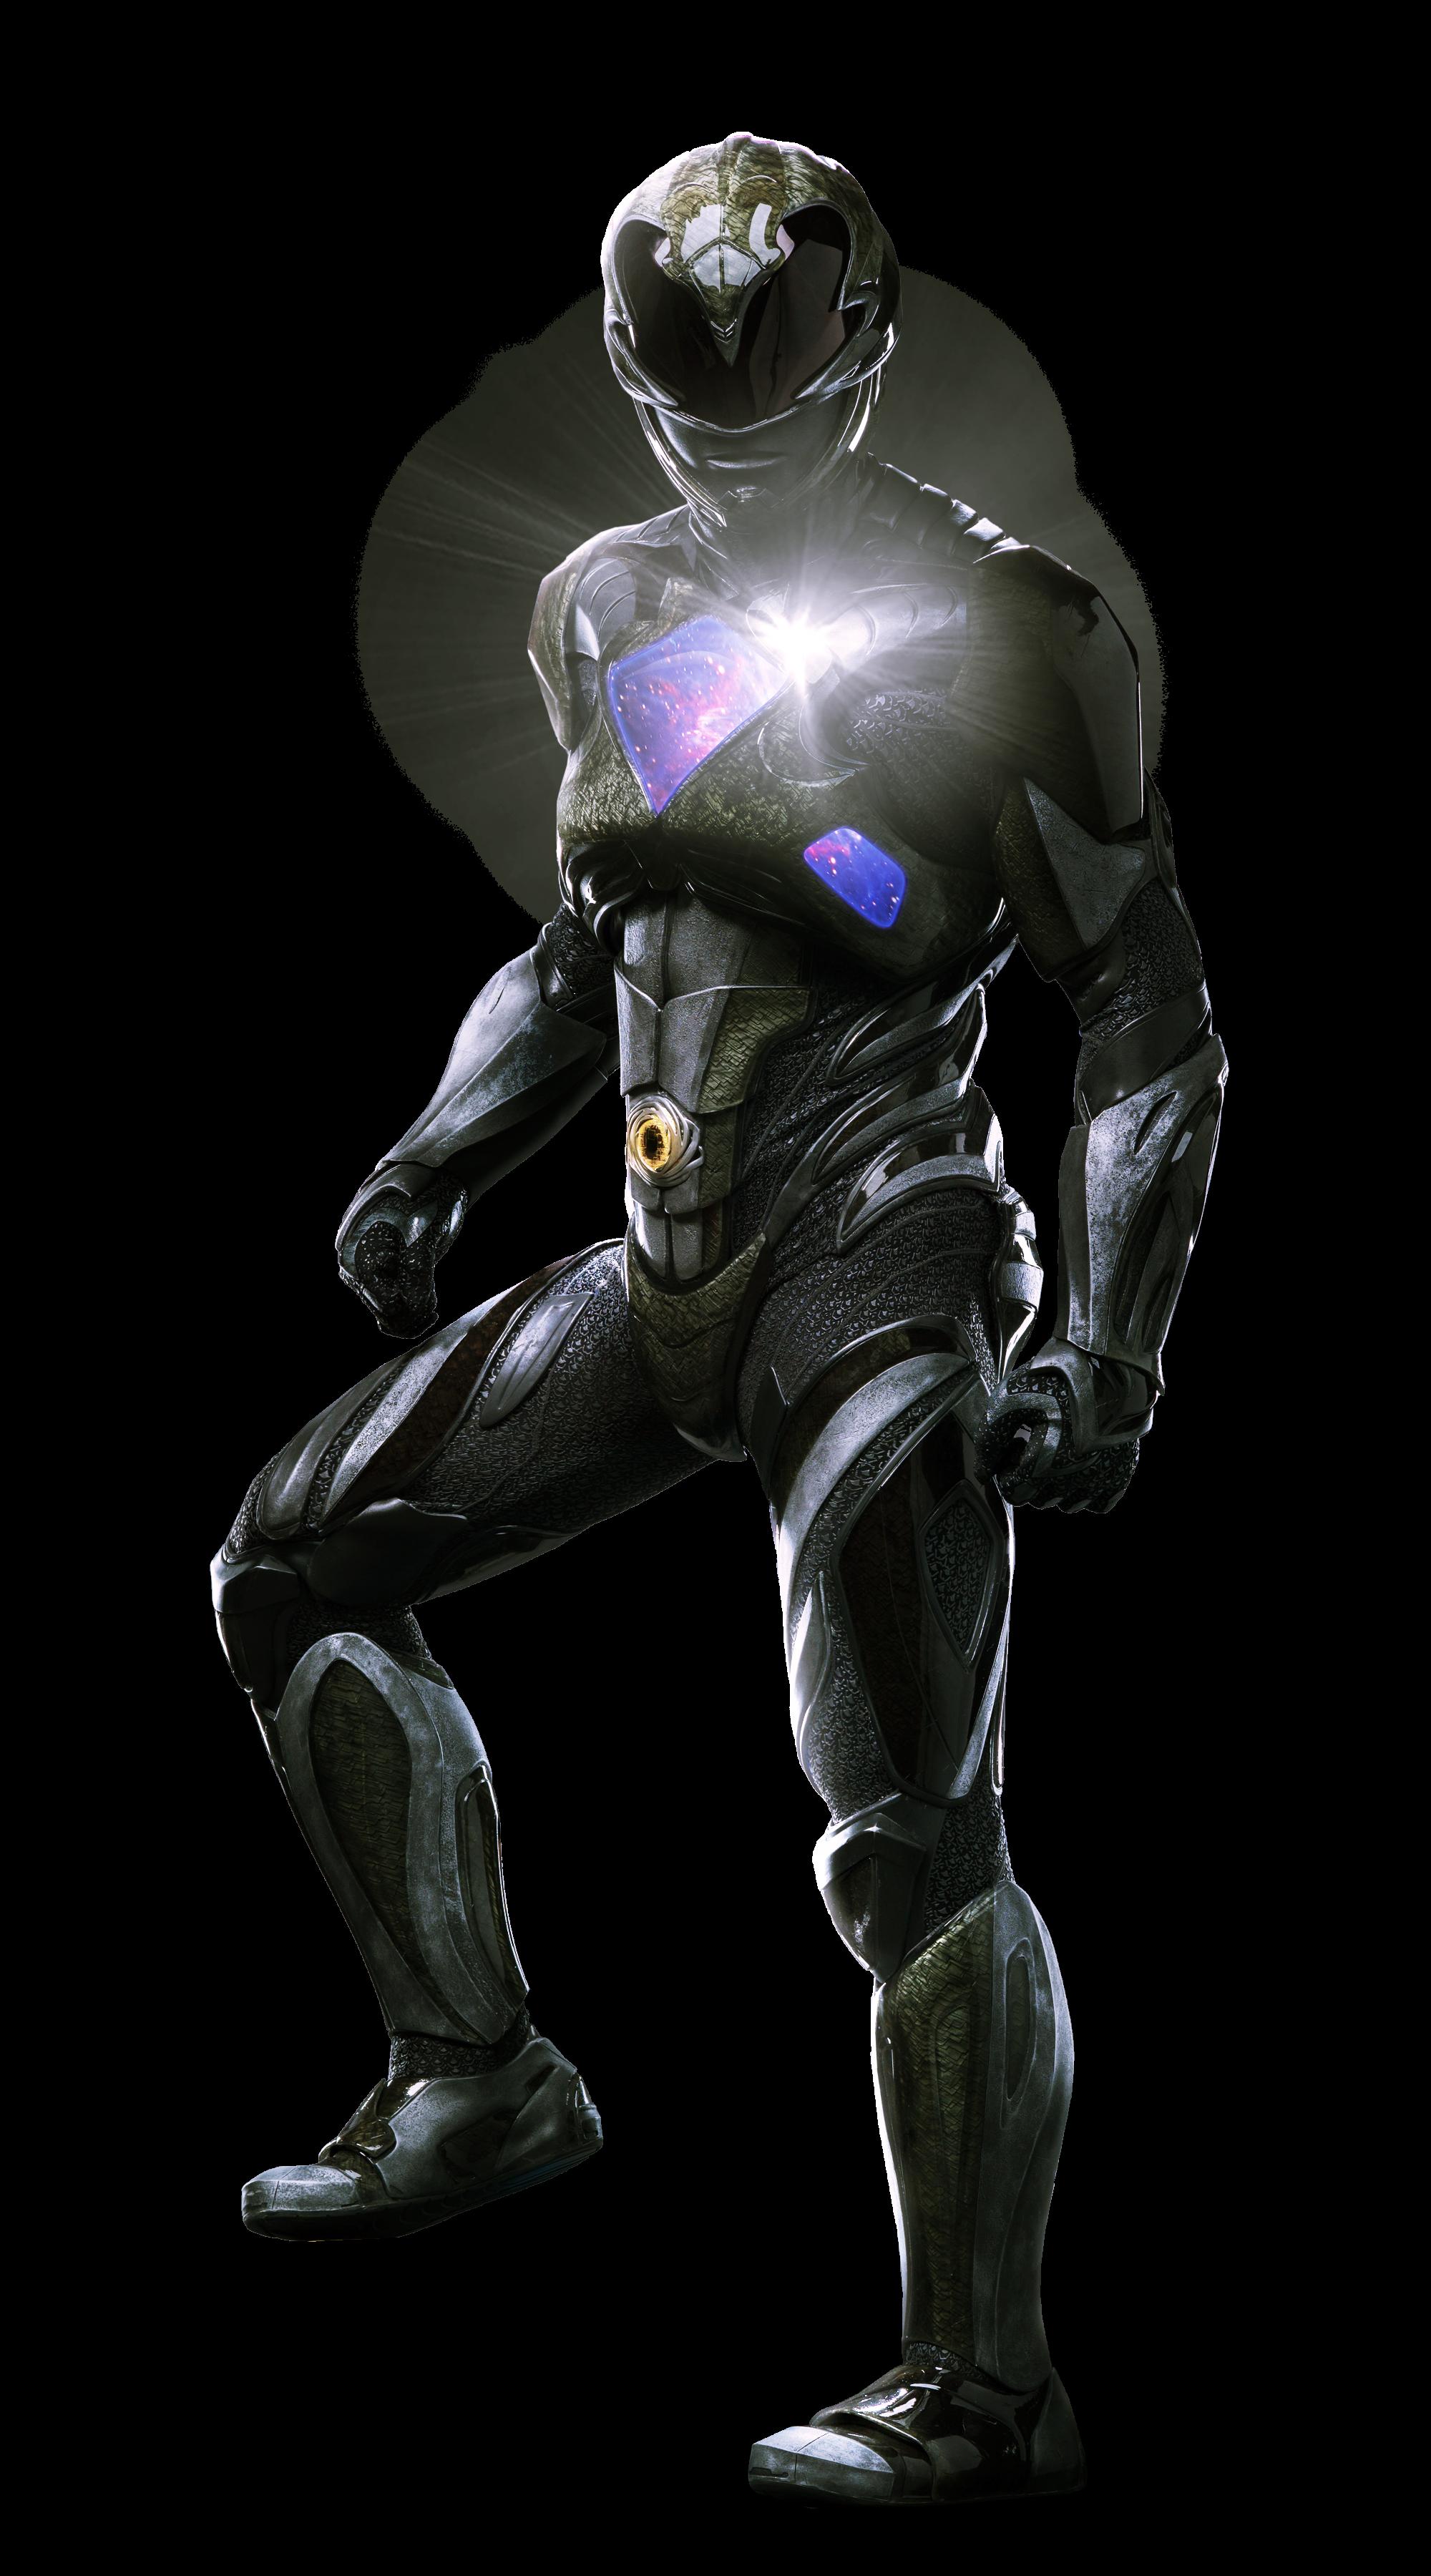 Black Ranger - Transparent by Asthonx1 on DeviantArt